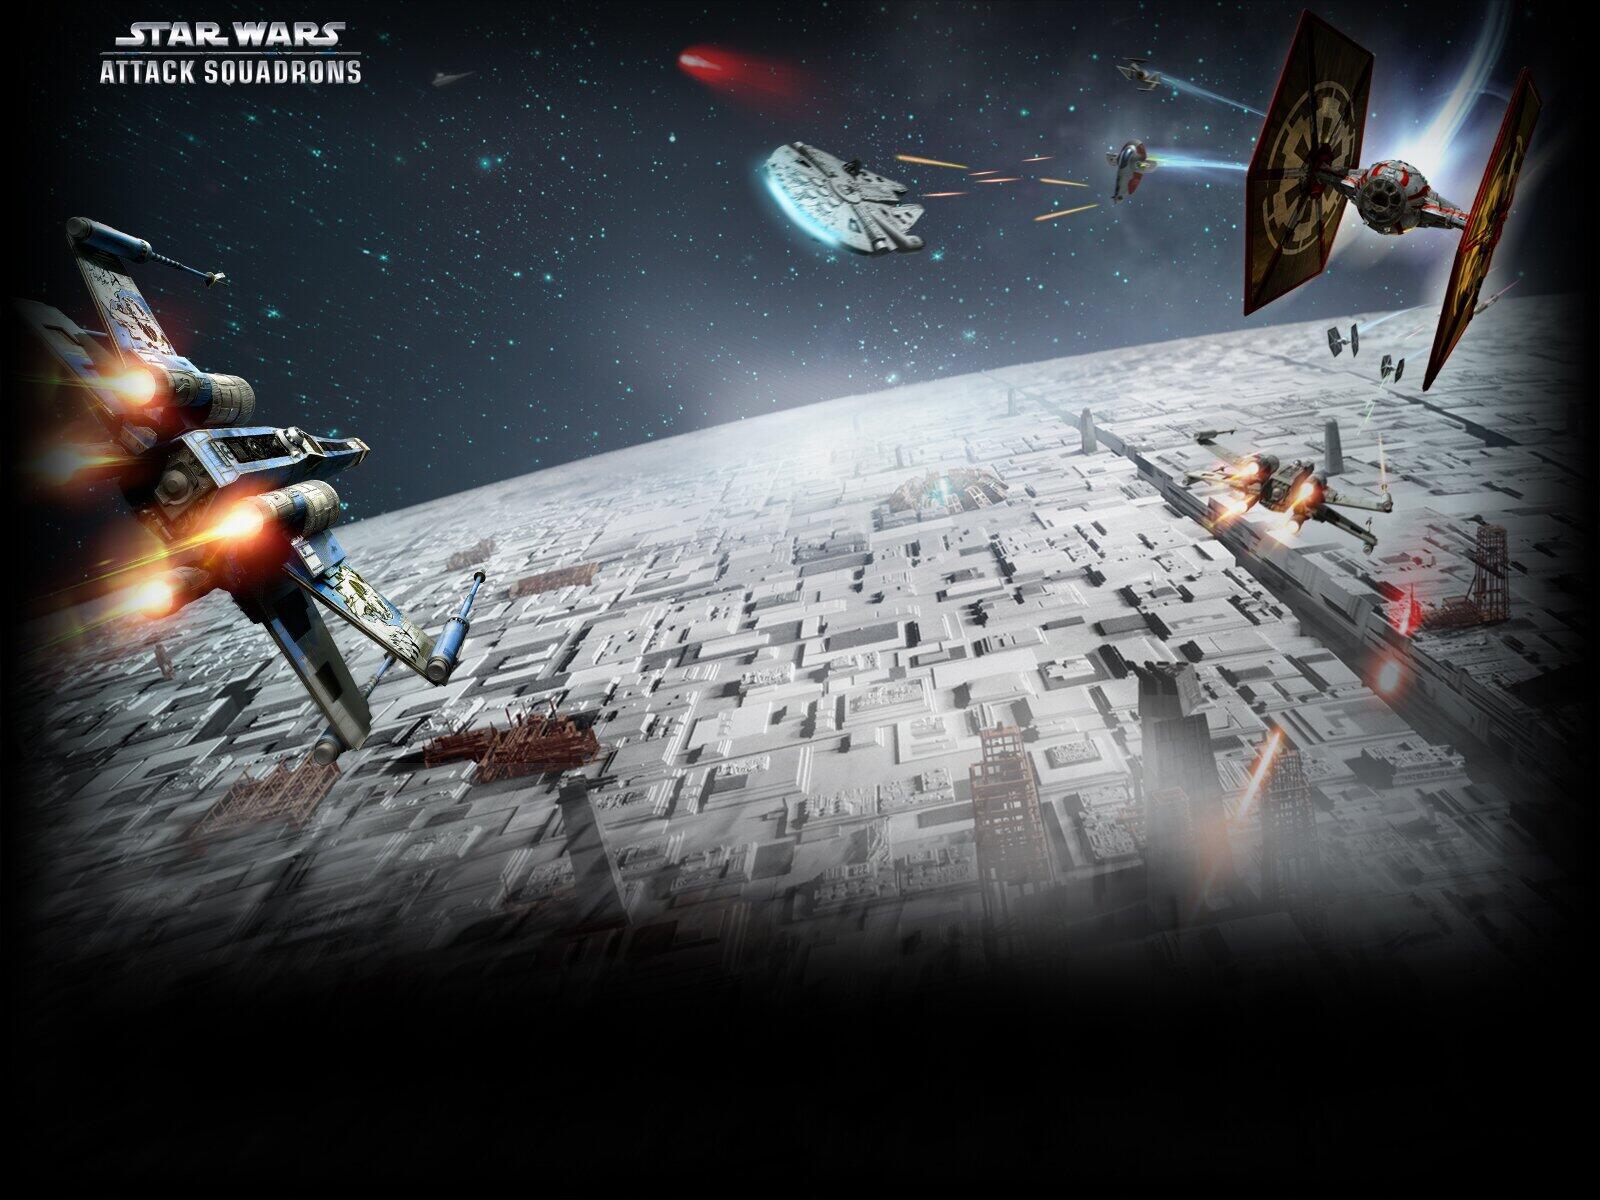 Star Wars Attack Squadrons wallpaper 1